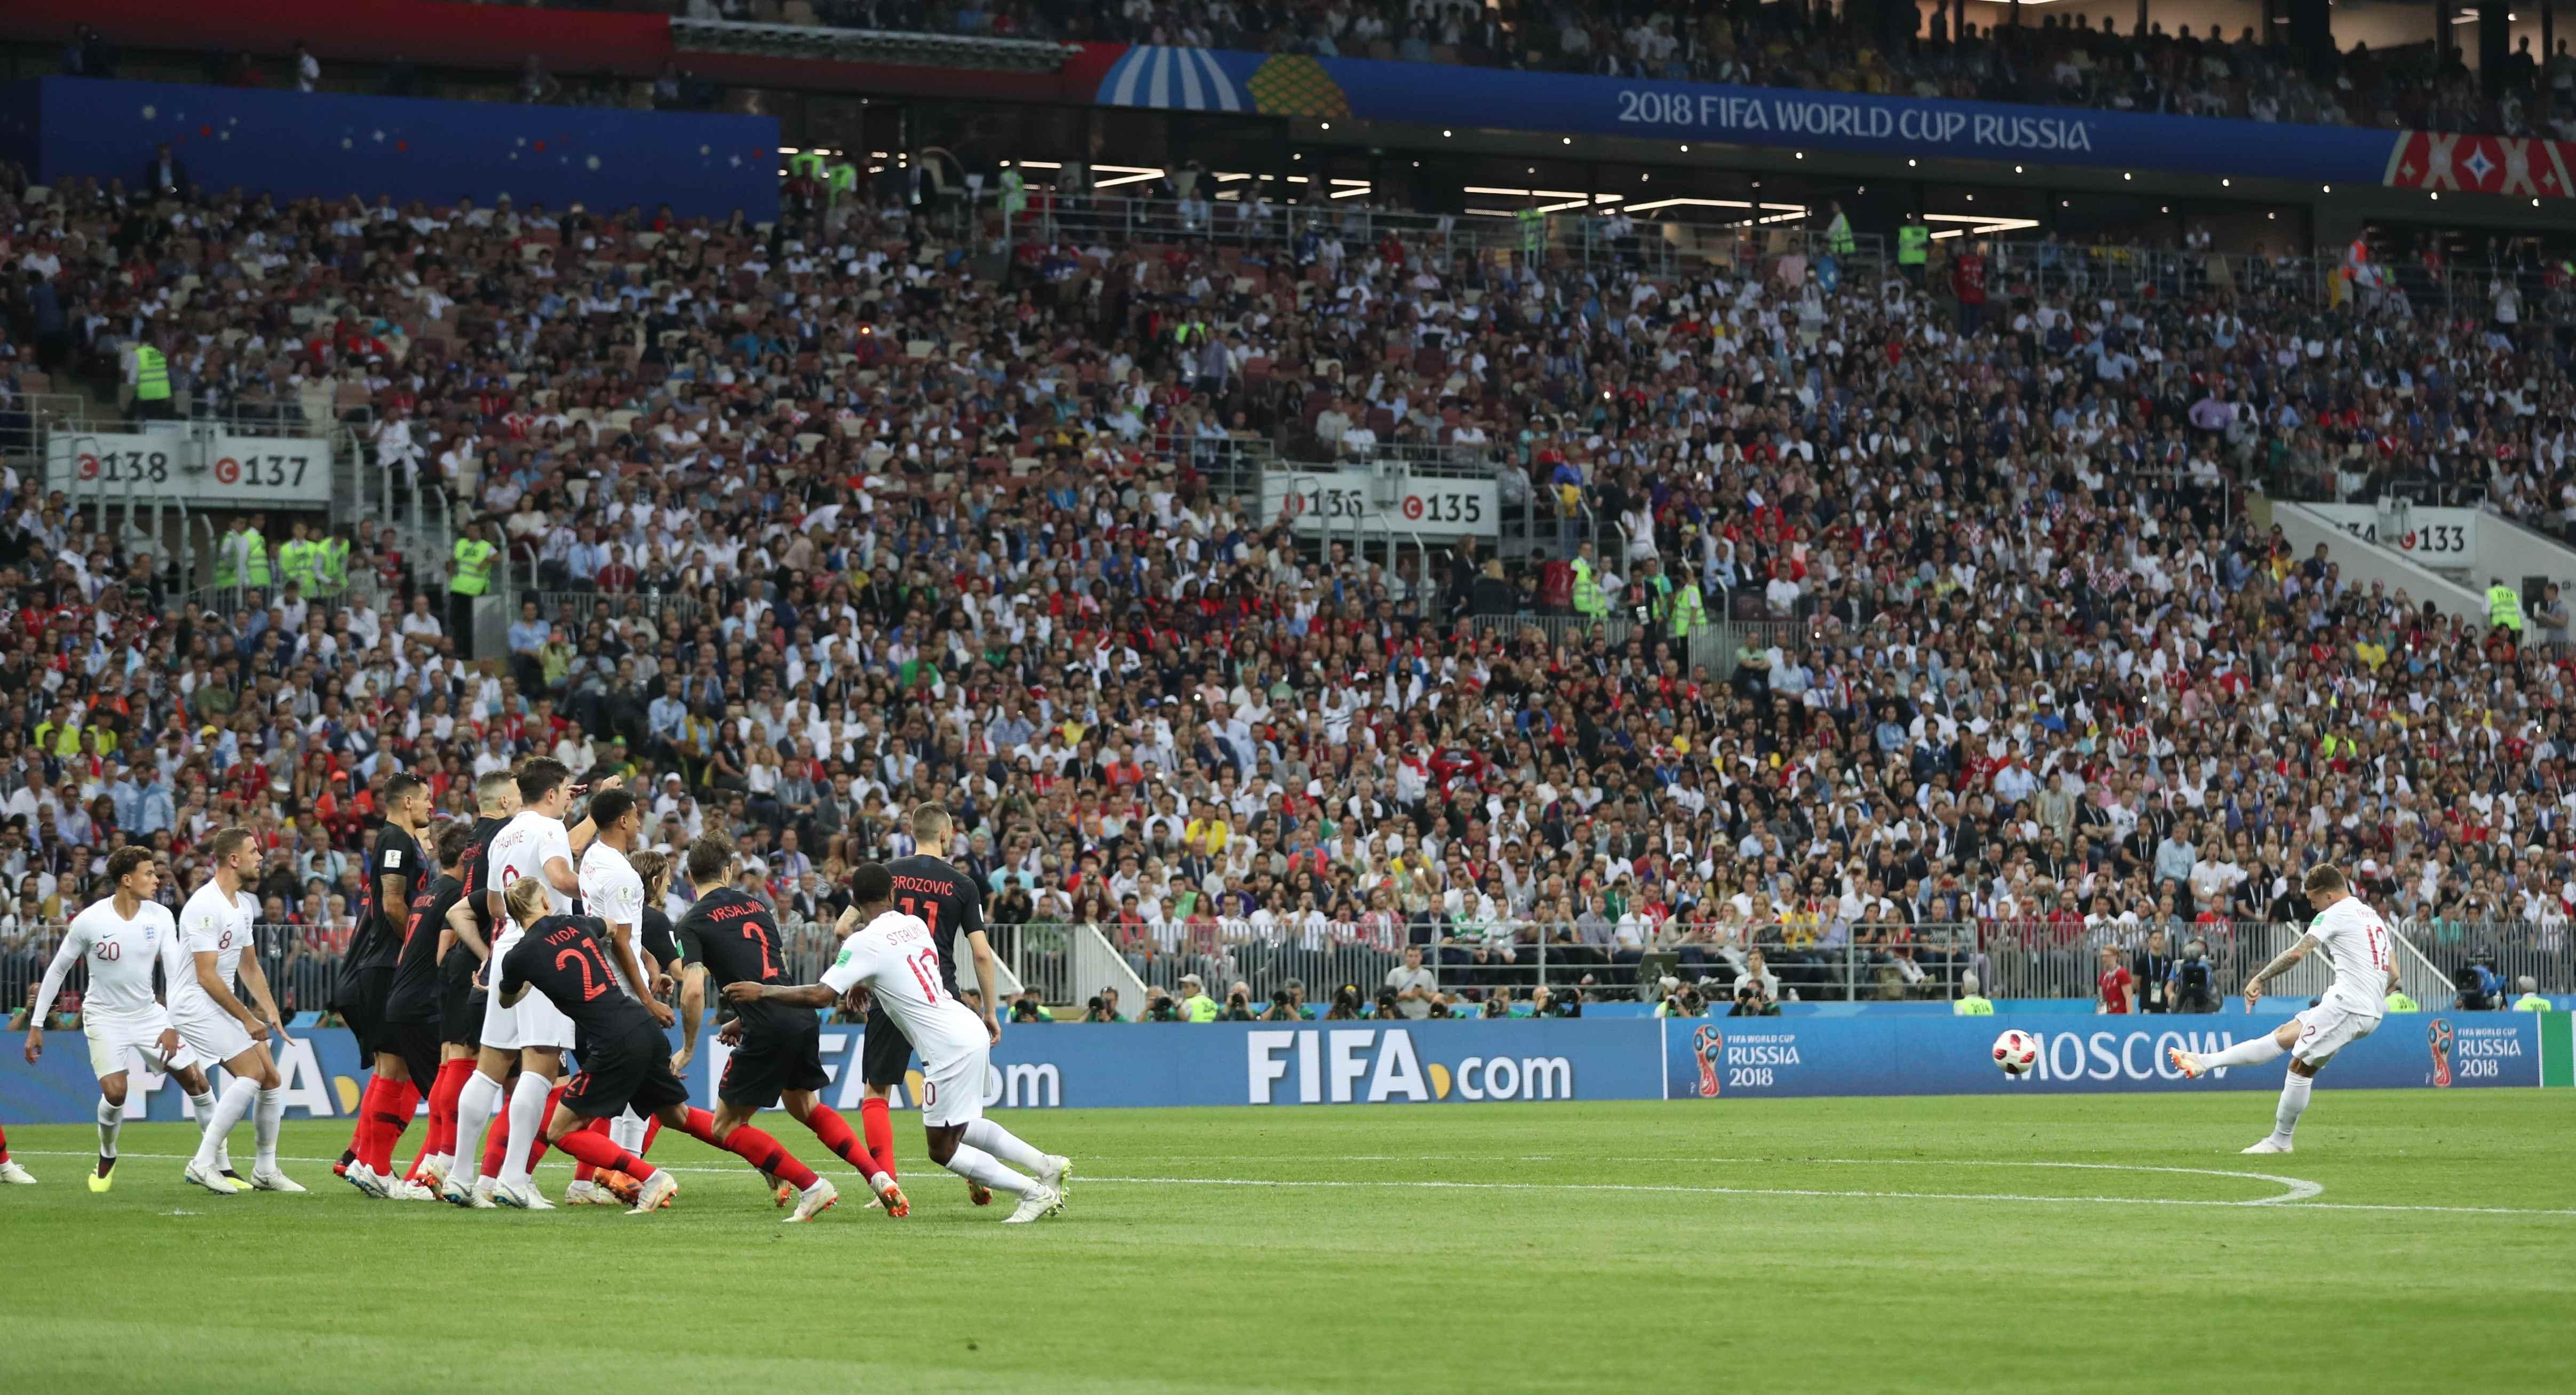 Kieran Trippier put England ahead with a great free-kick